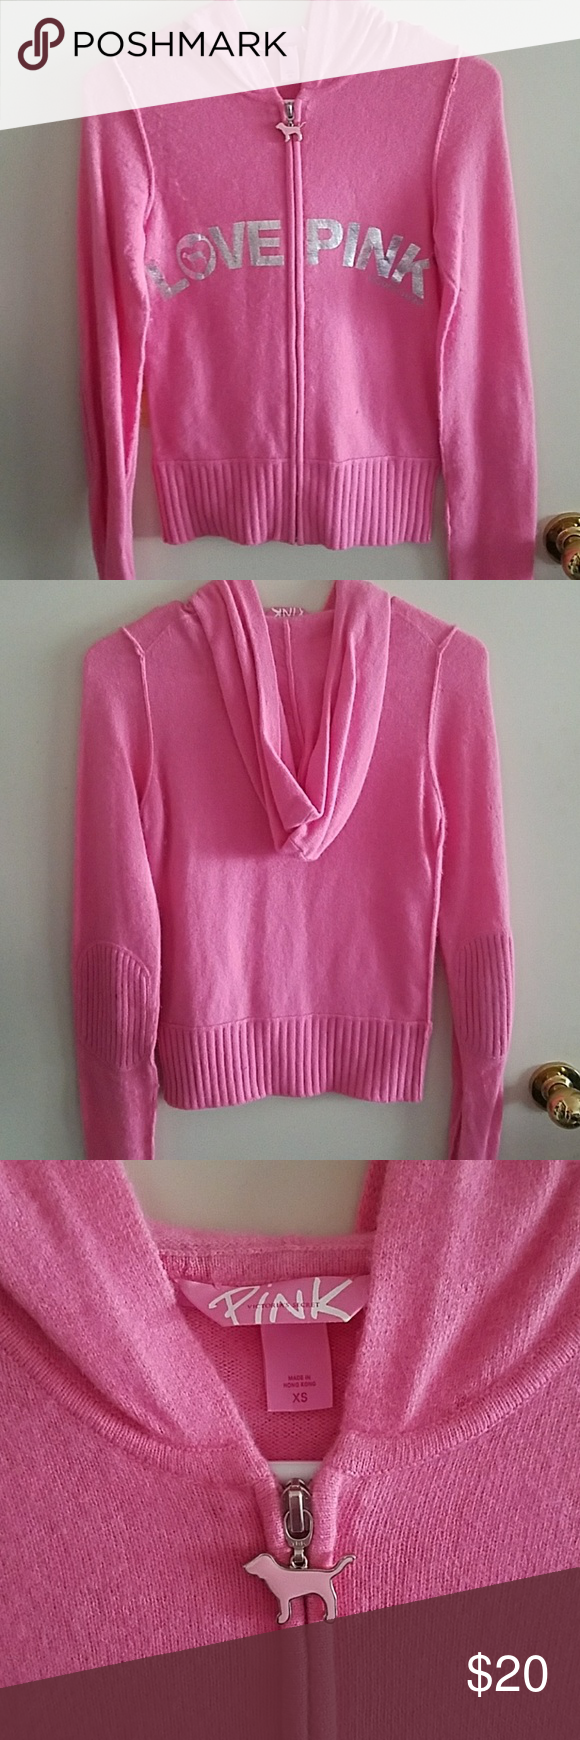 Full zipper Pink sweater | Angora rabbit, Pink dog and Lambs